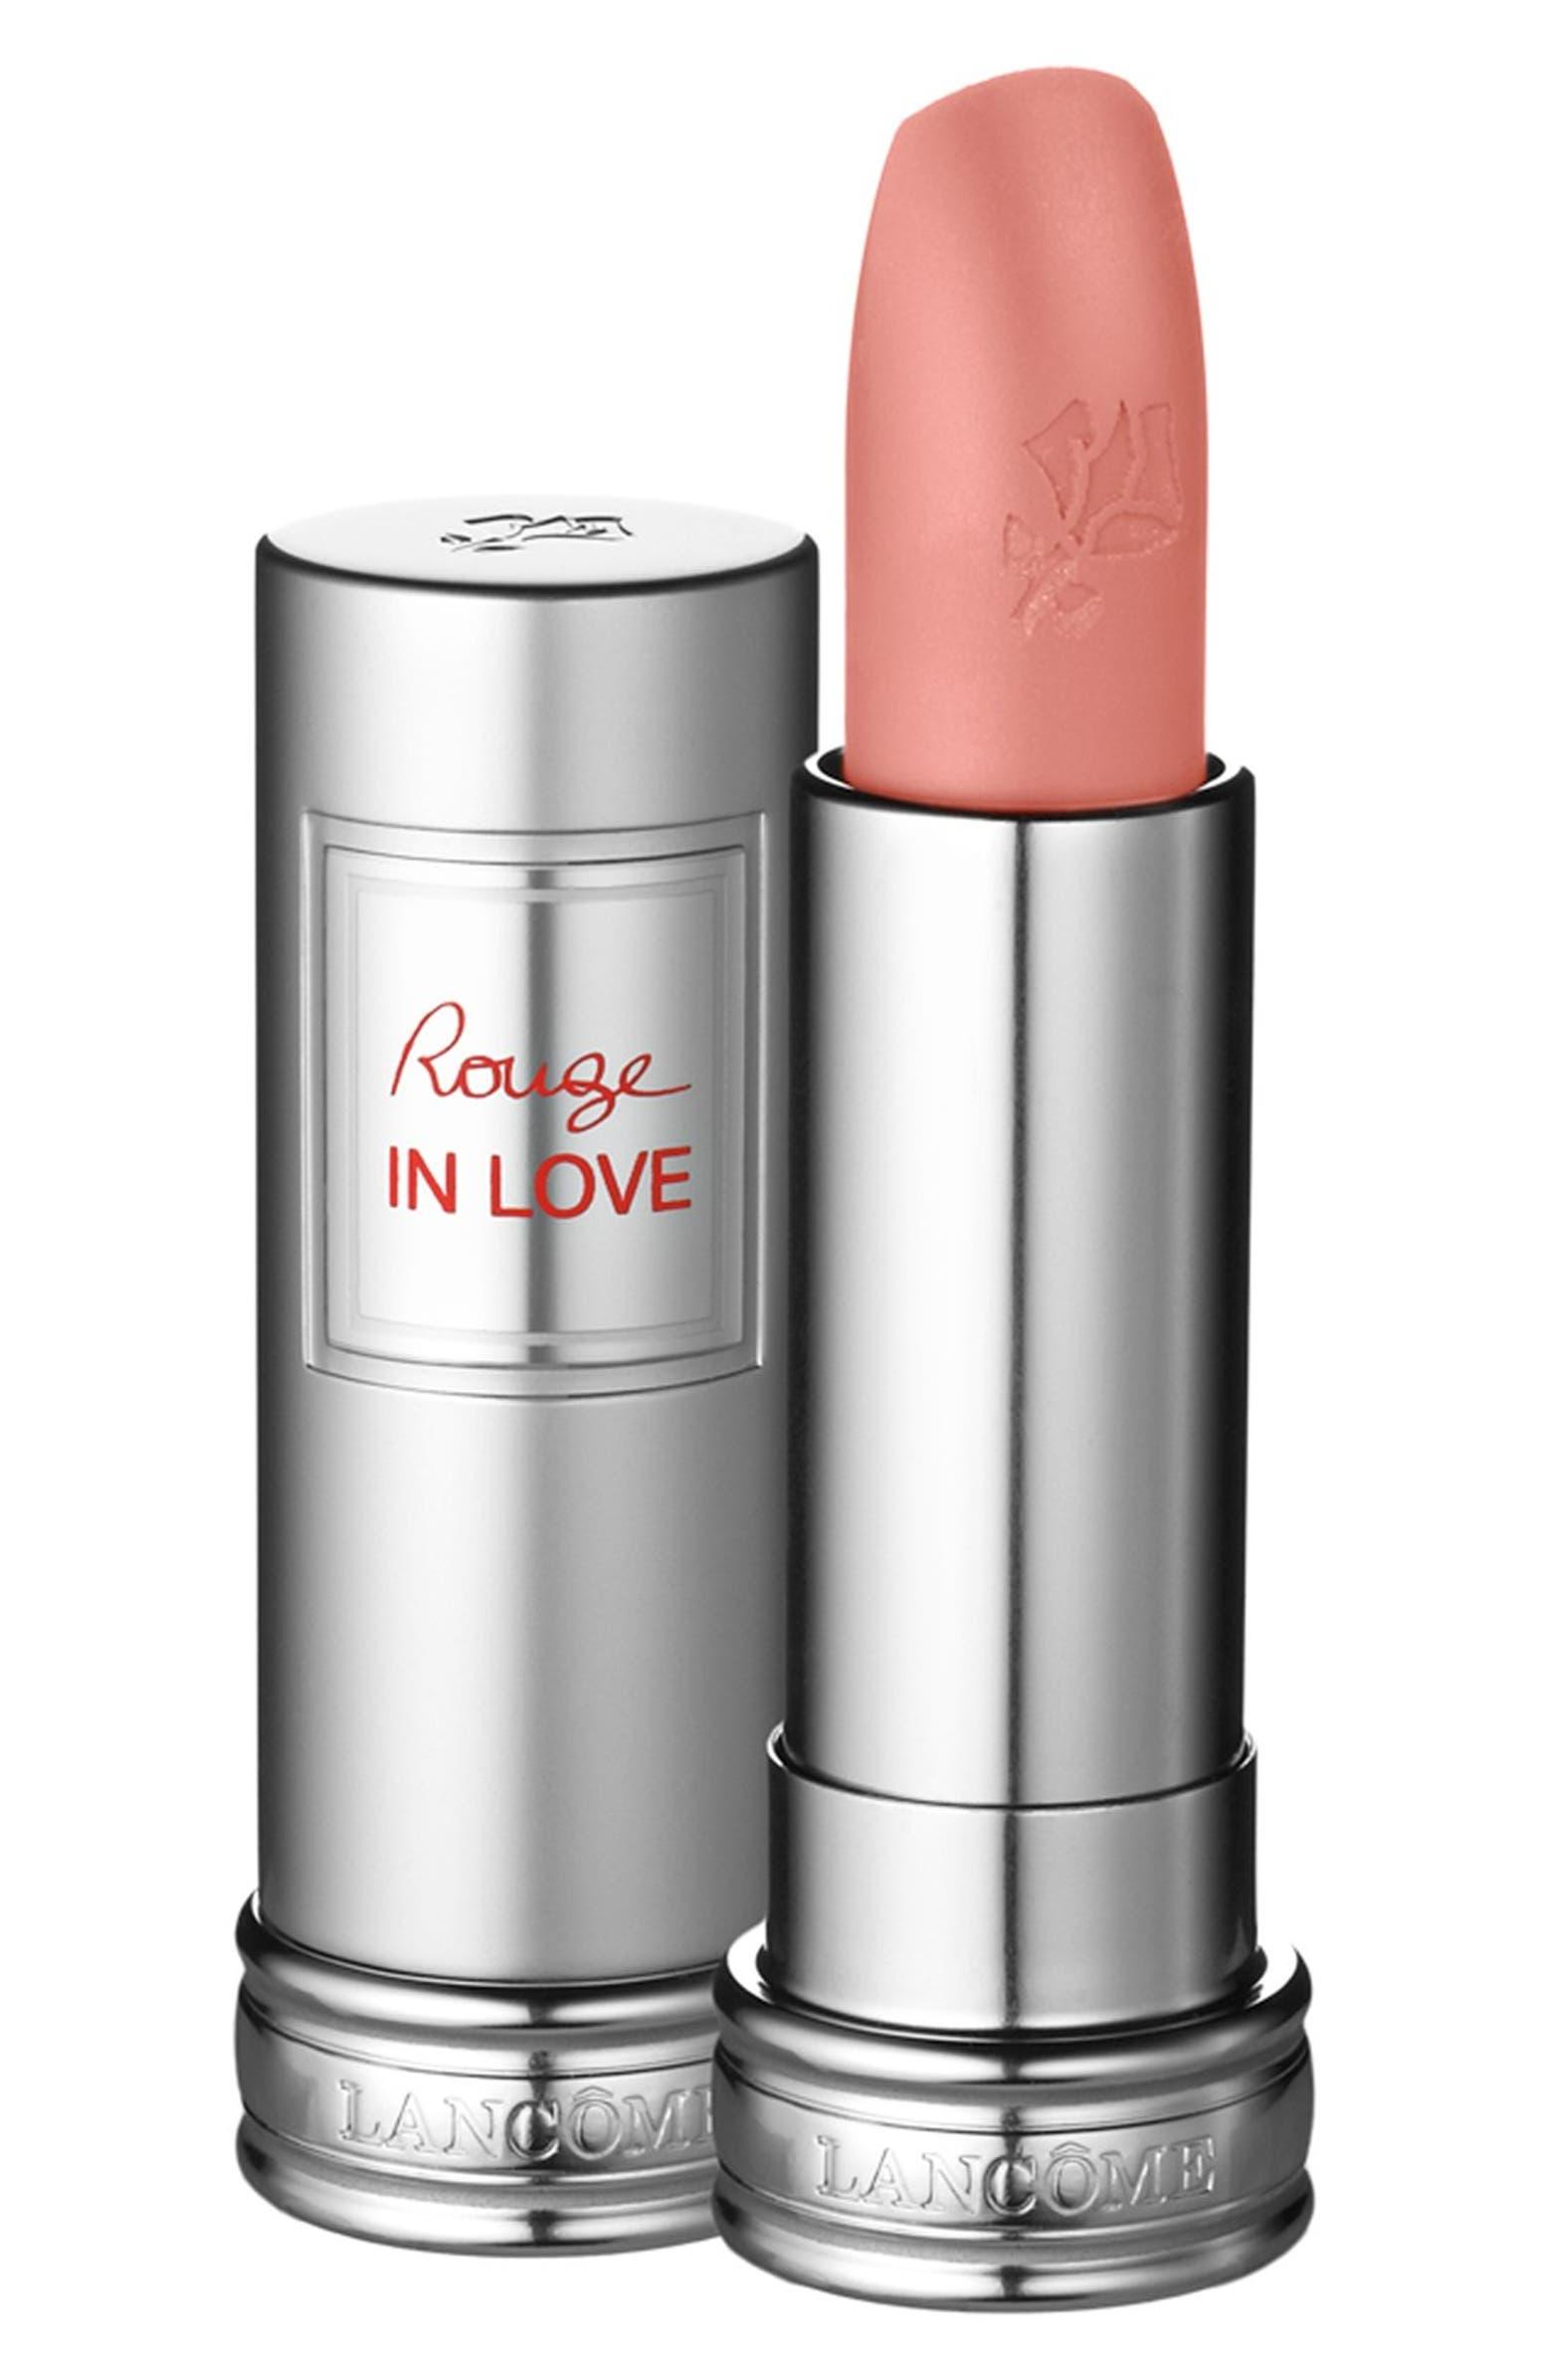 Rouge in Love Long-Lasting Lipstick LANCÔME